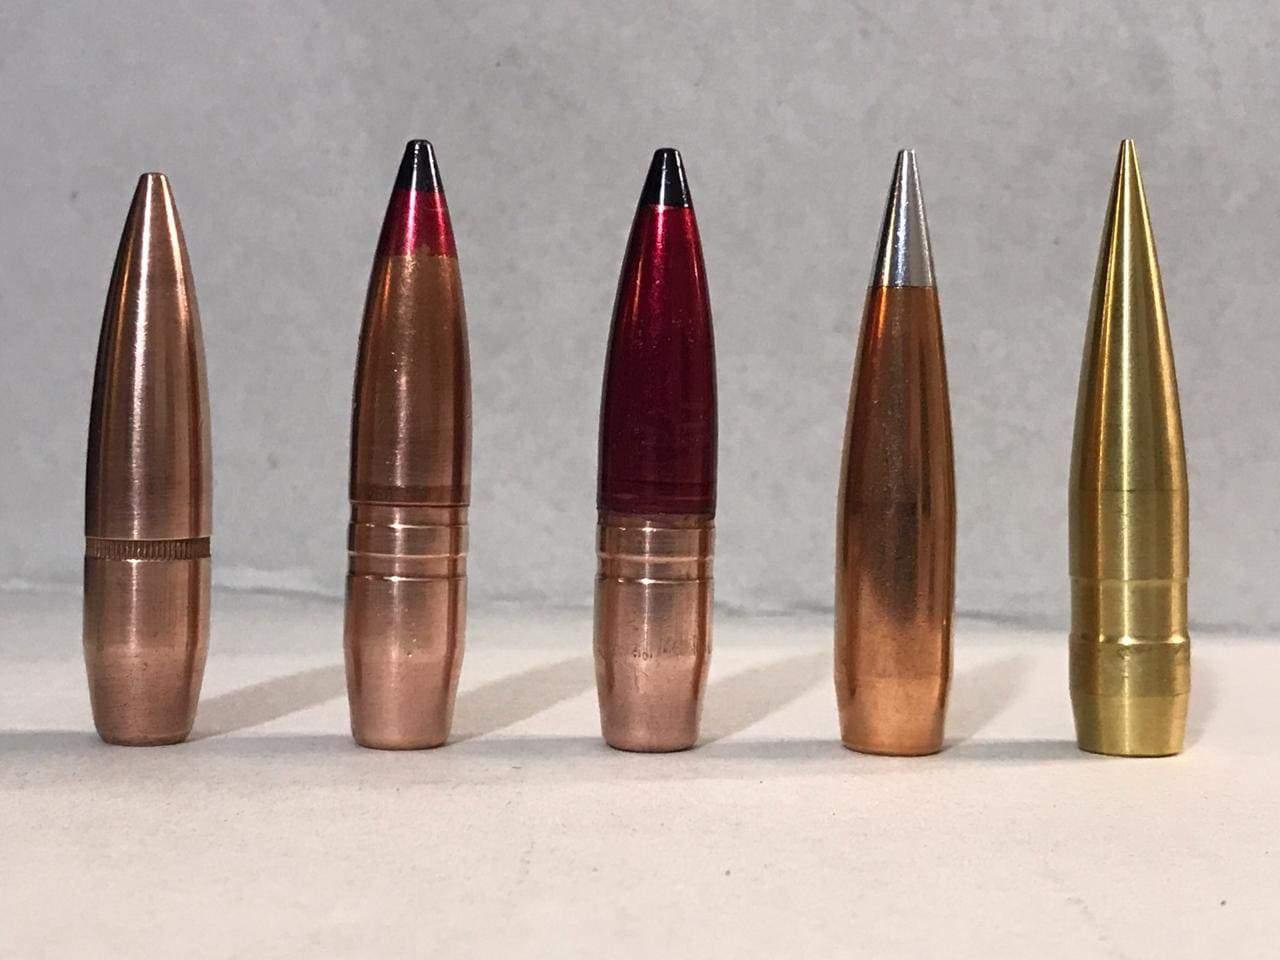 На фото зліва направо: Ball M33, Б32, БС, 750 A-Max, 750 Match Solid